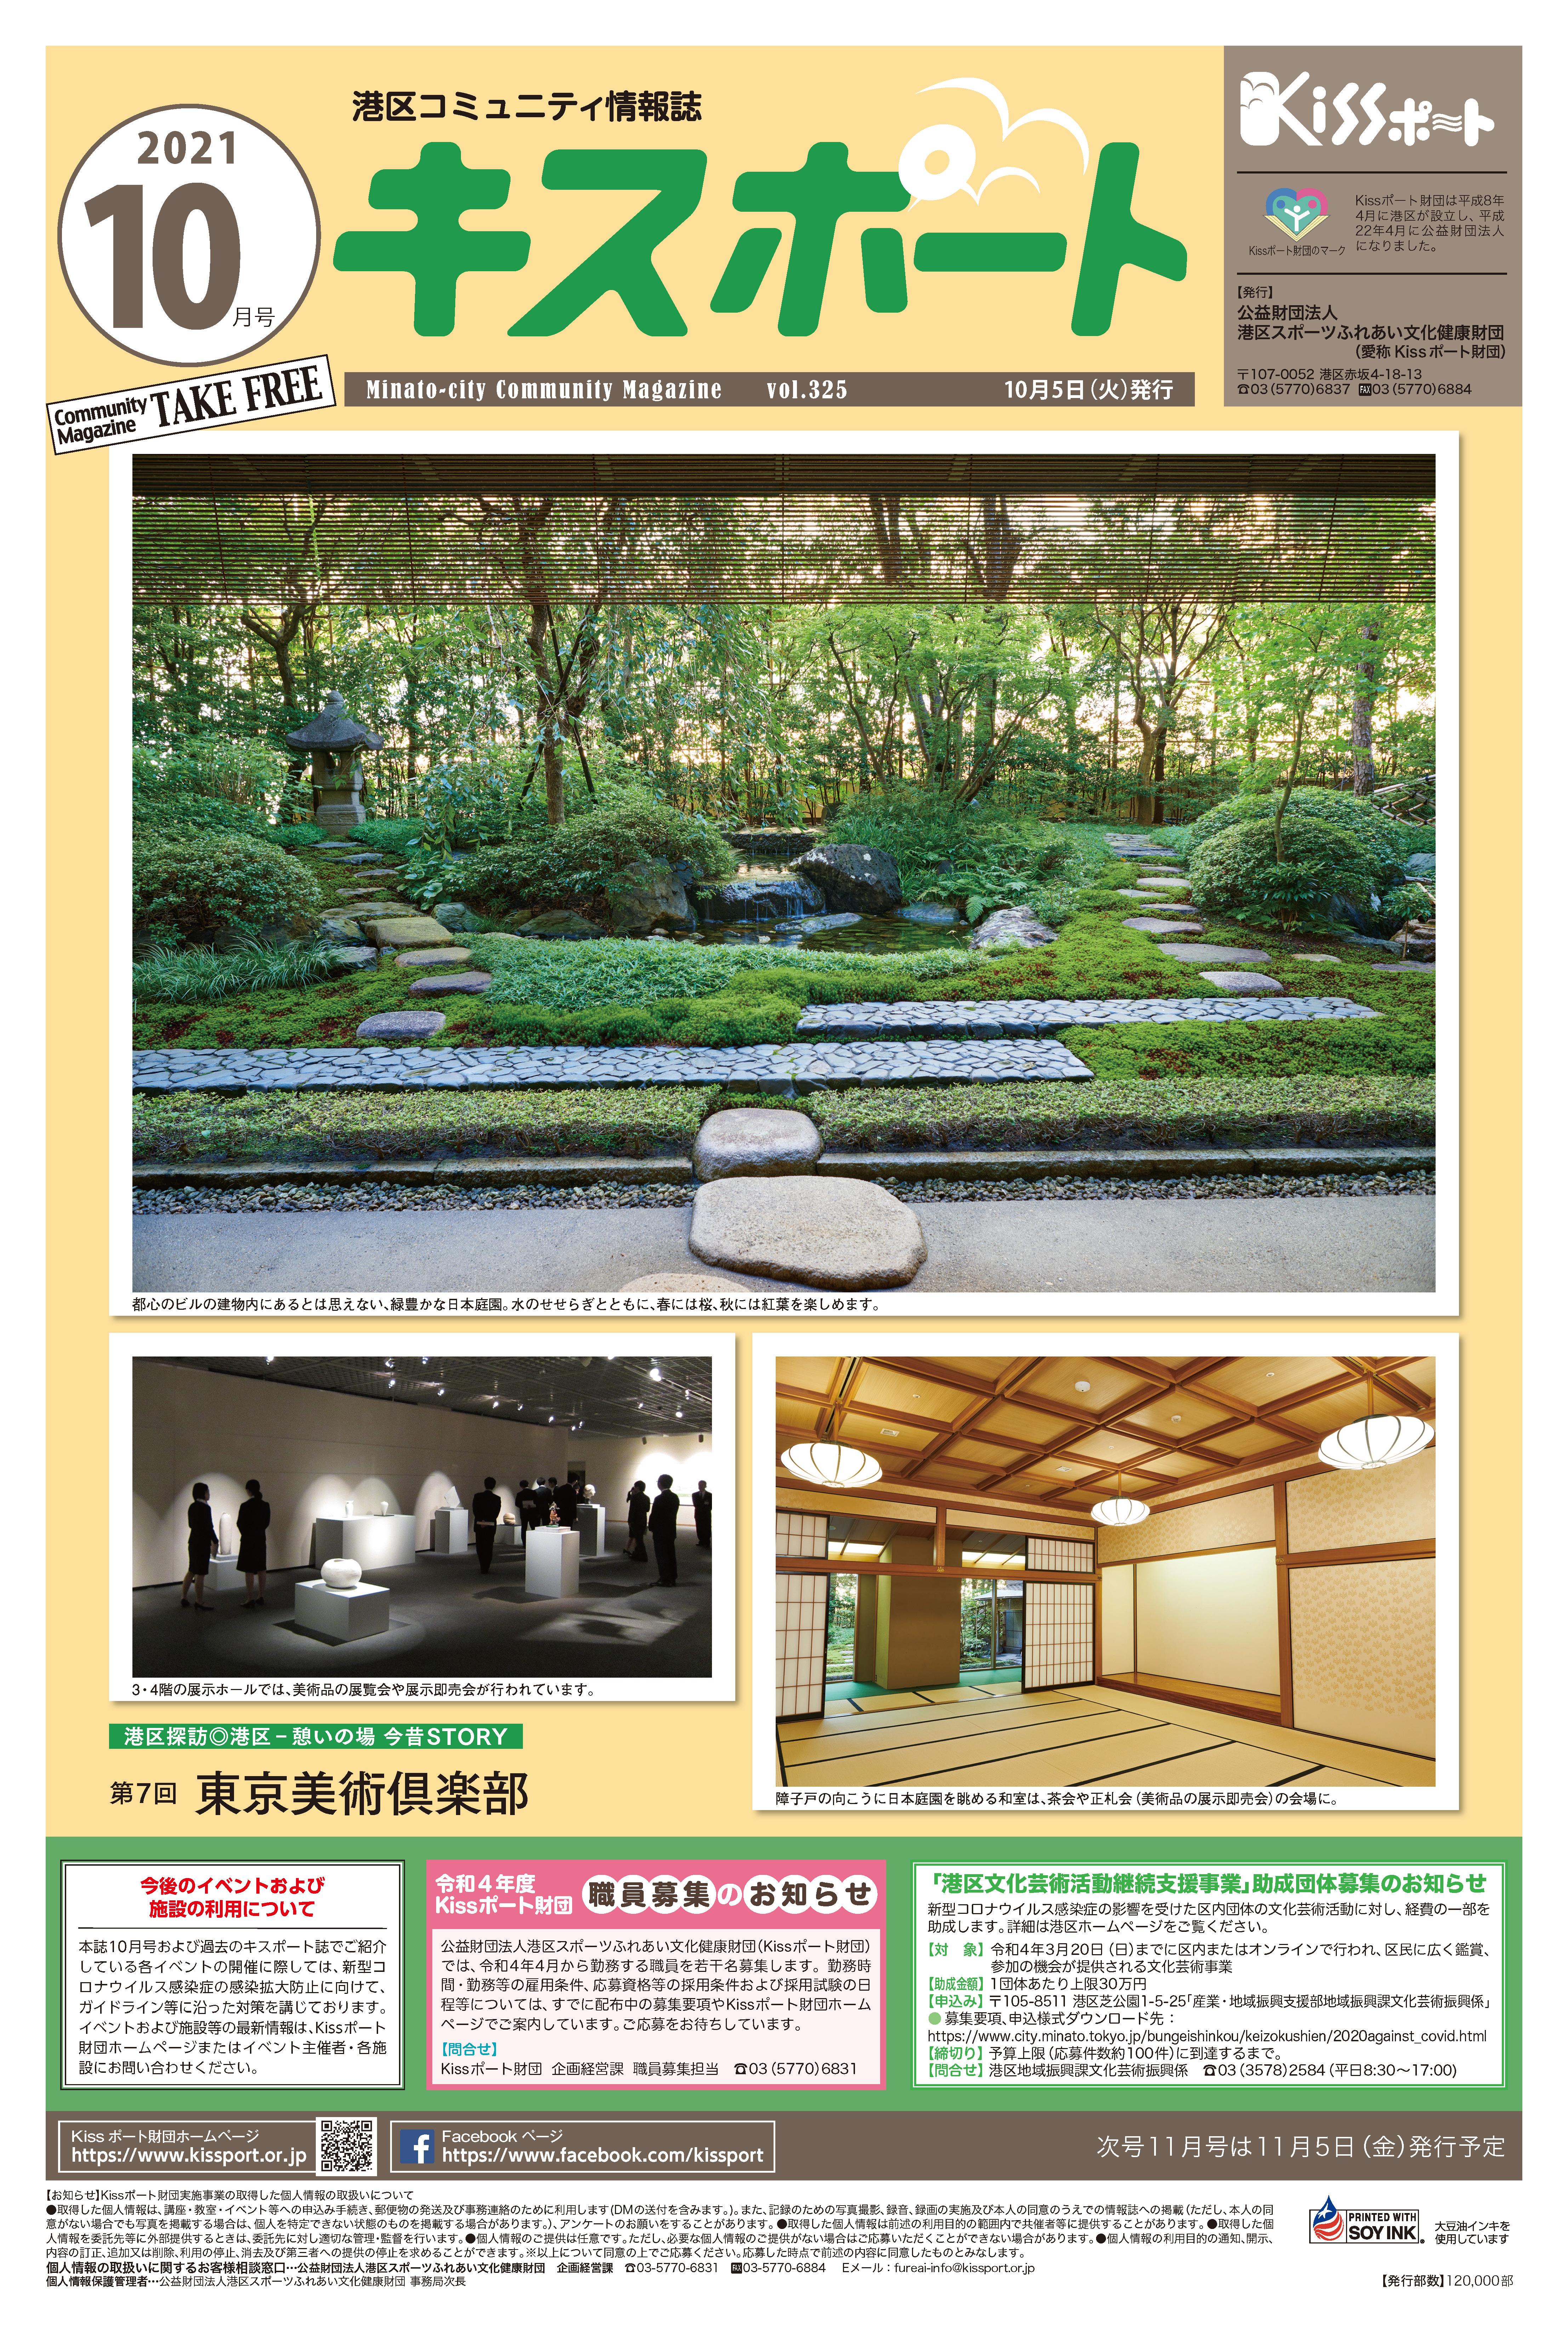 KISSポート2021年10月号表紙イメージ